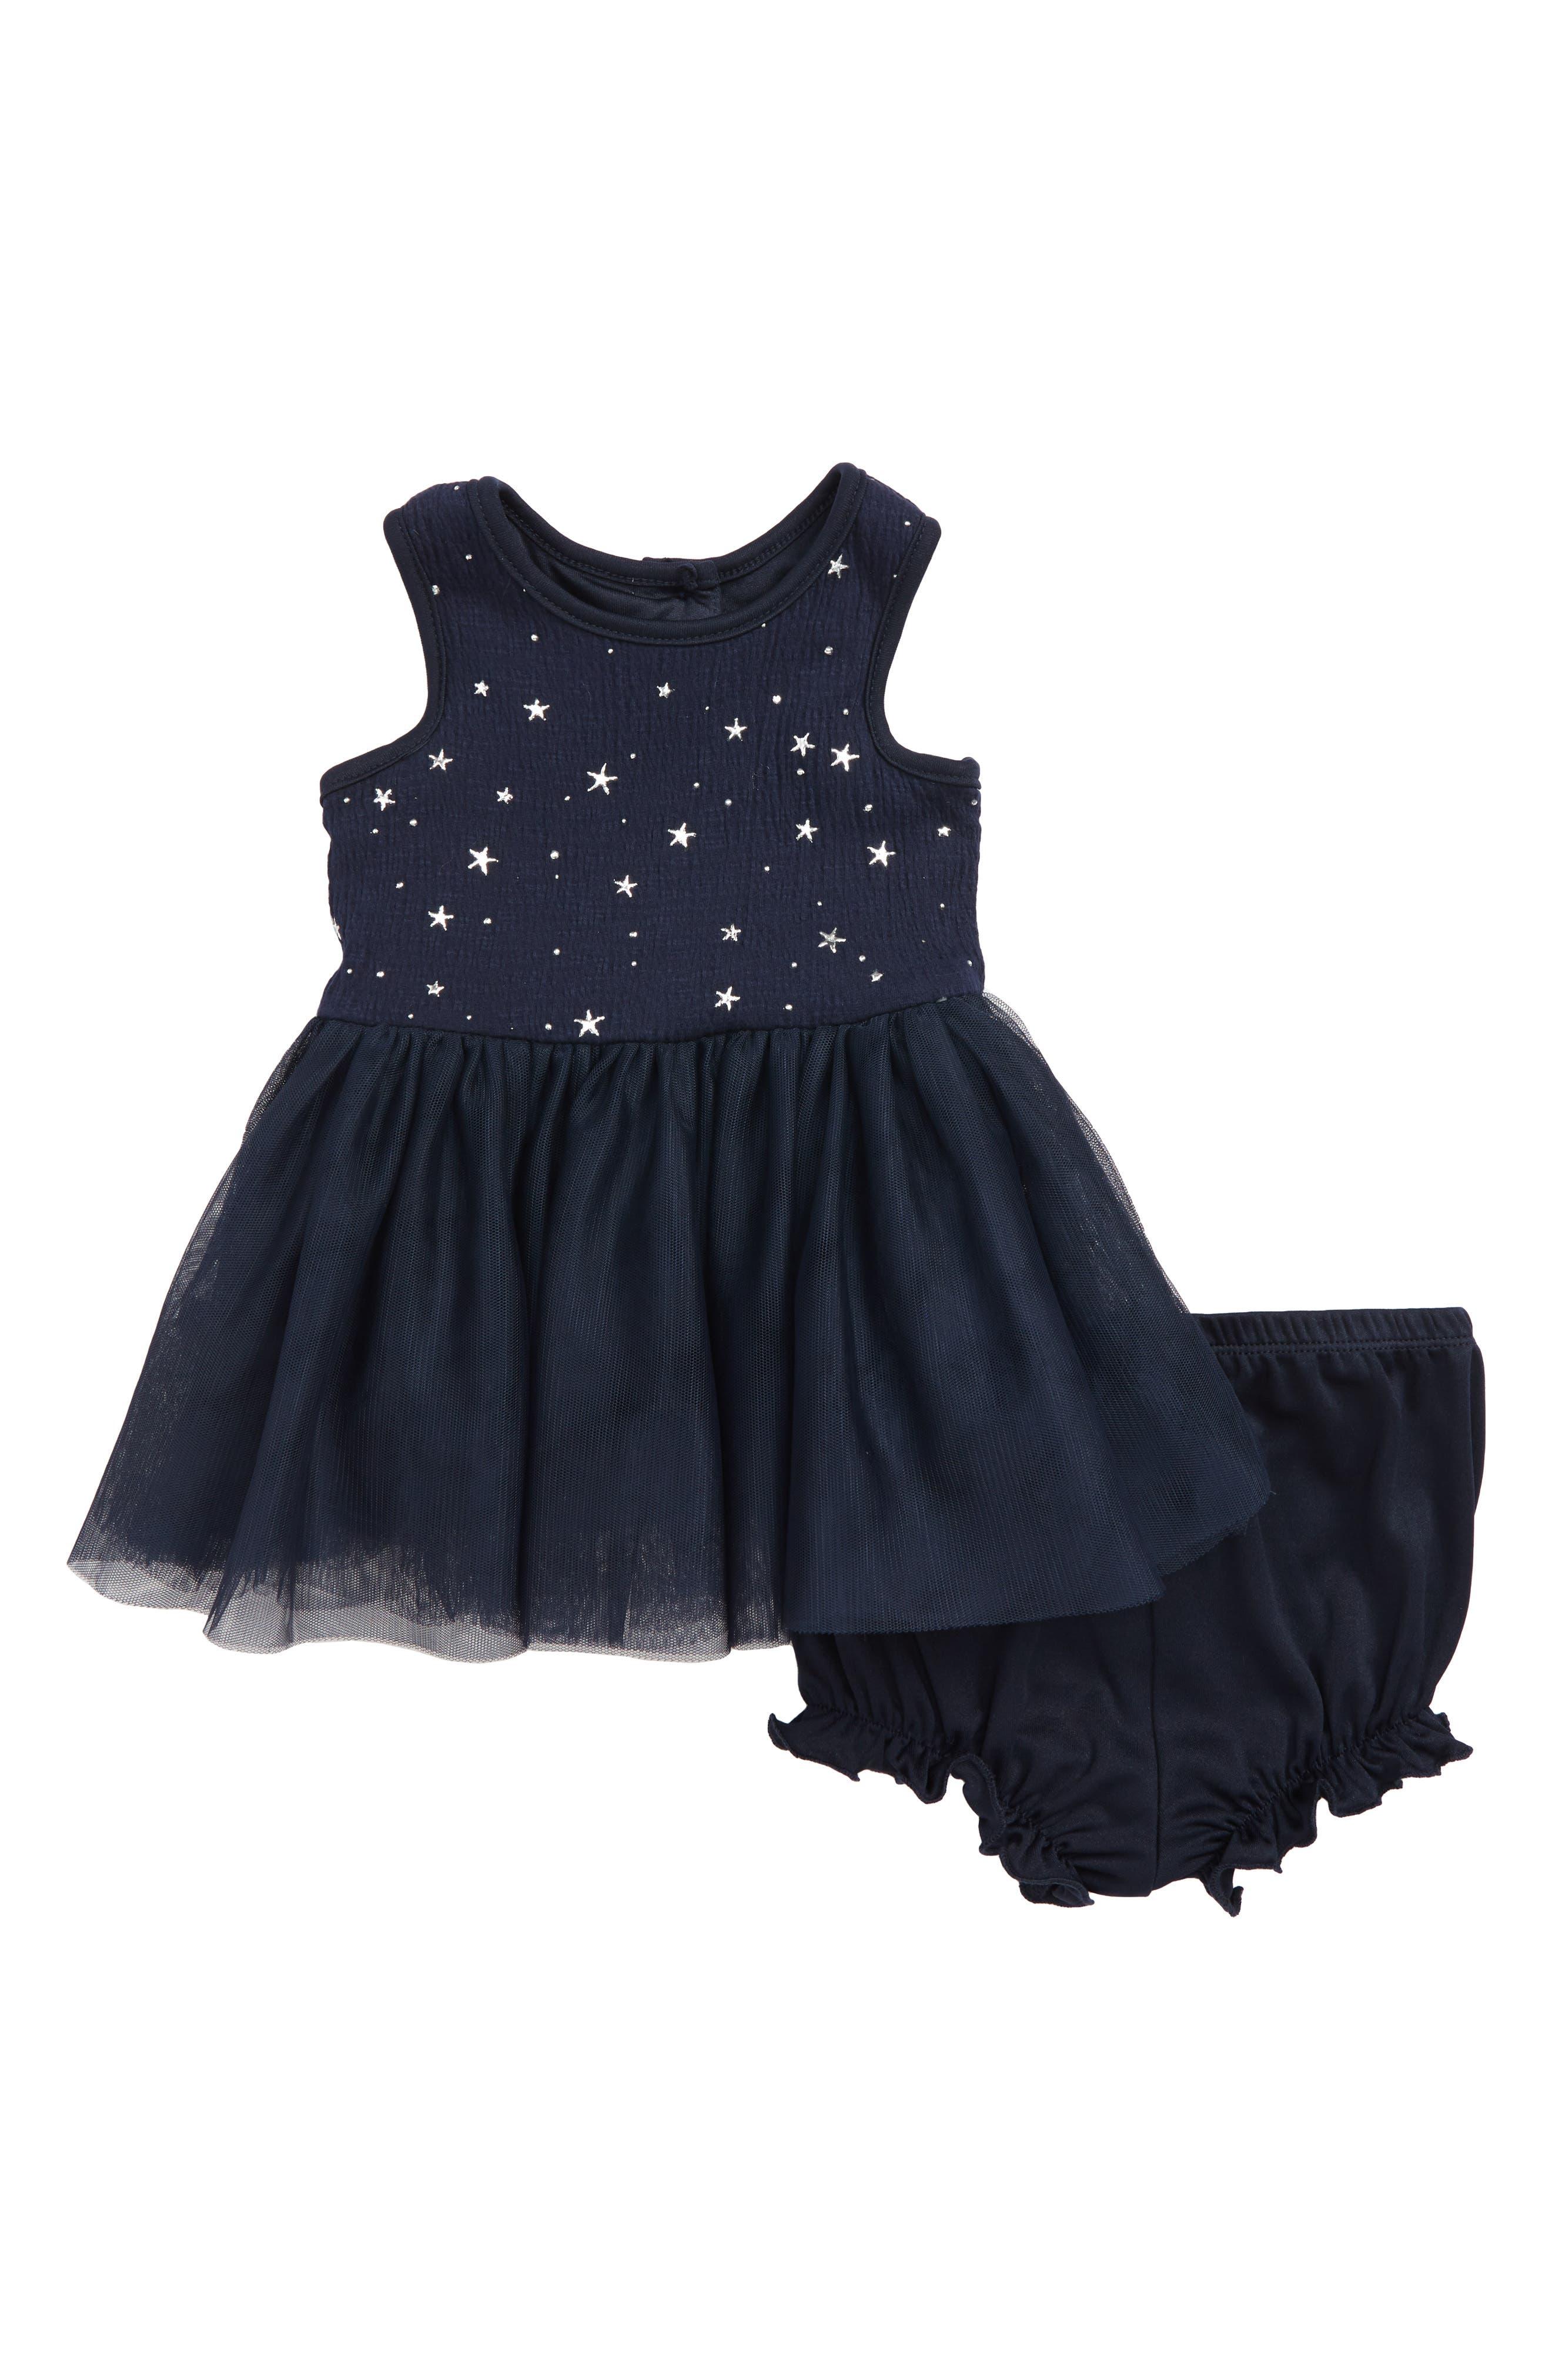 Stars Tutu Dress,                             Main thumbnail 1, color,                             NAVY